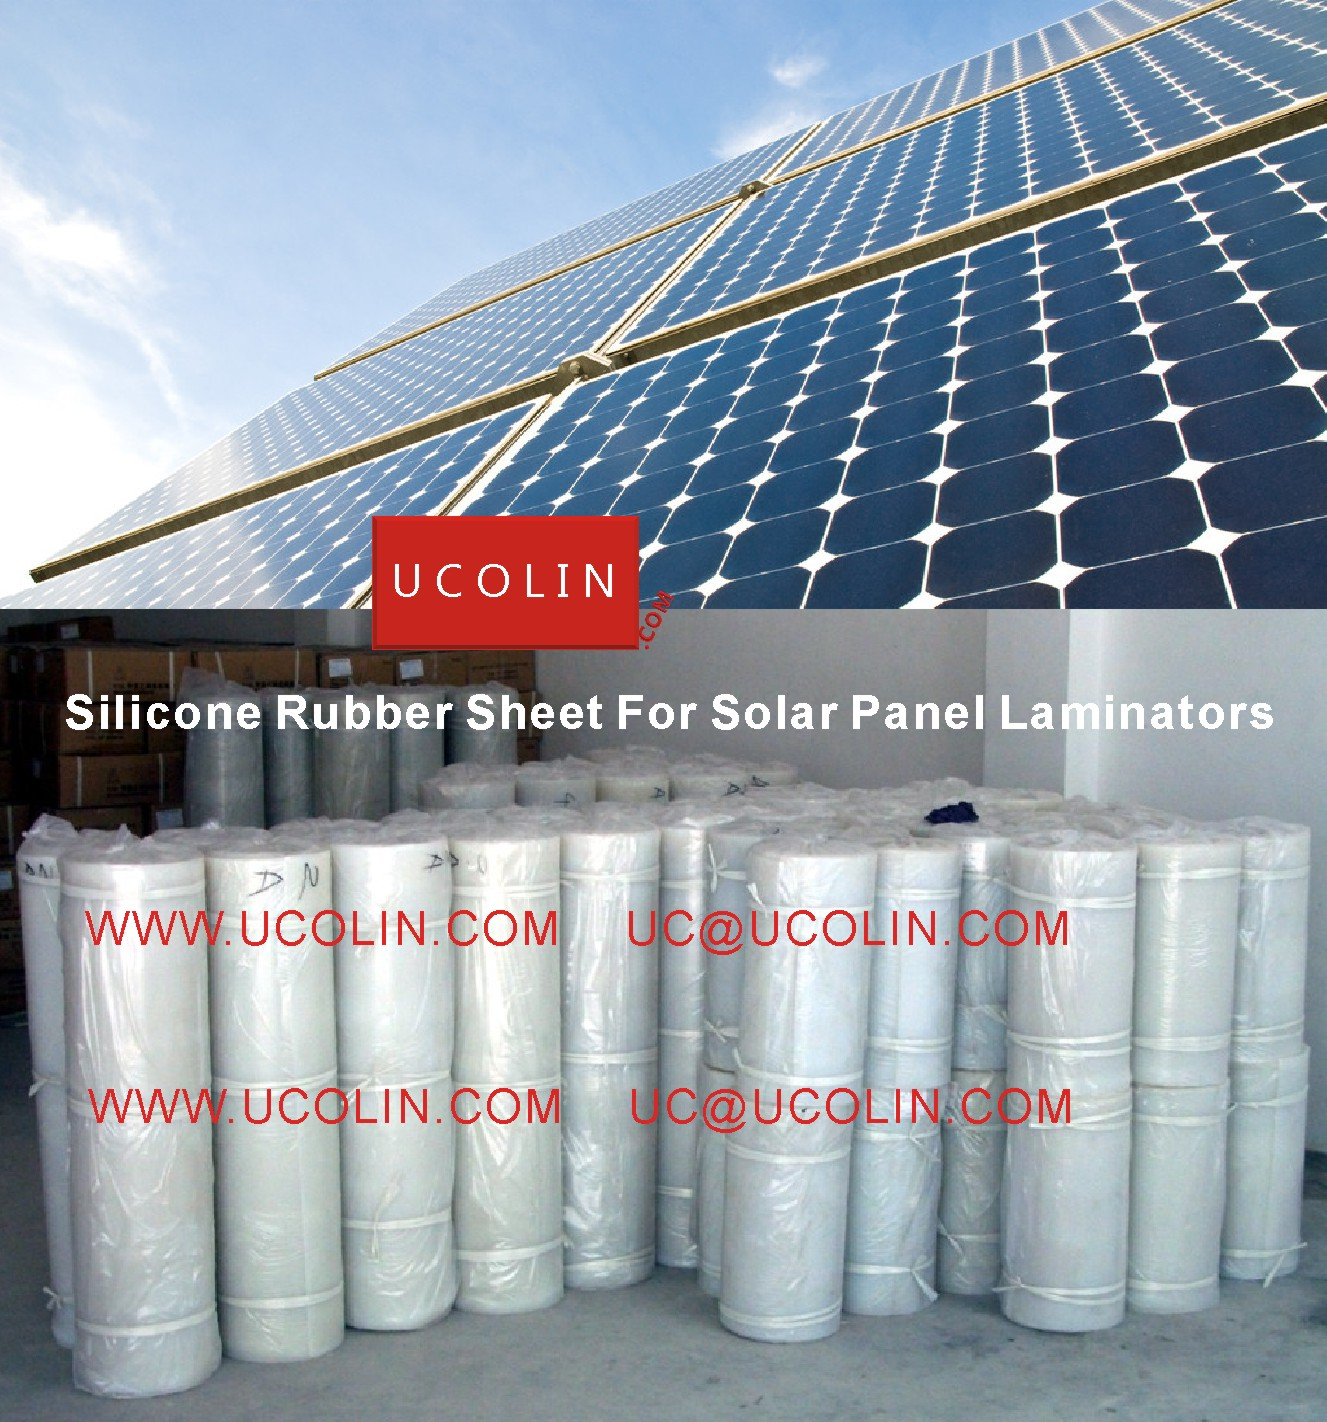 004 Silicon Rubber Sheet For Solar Panel Laminators